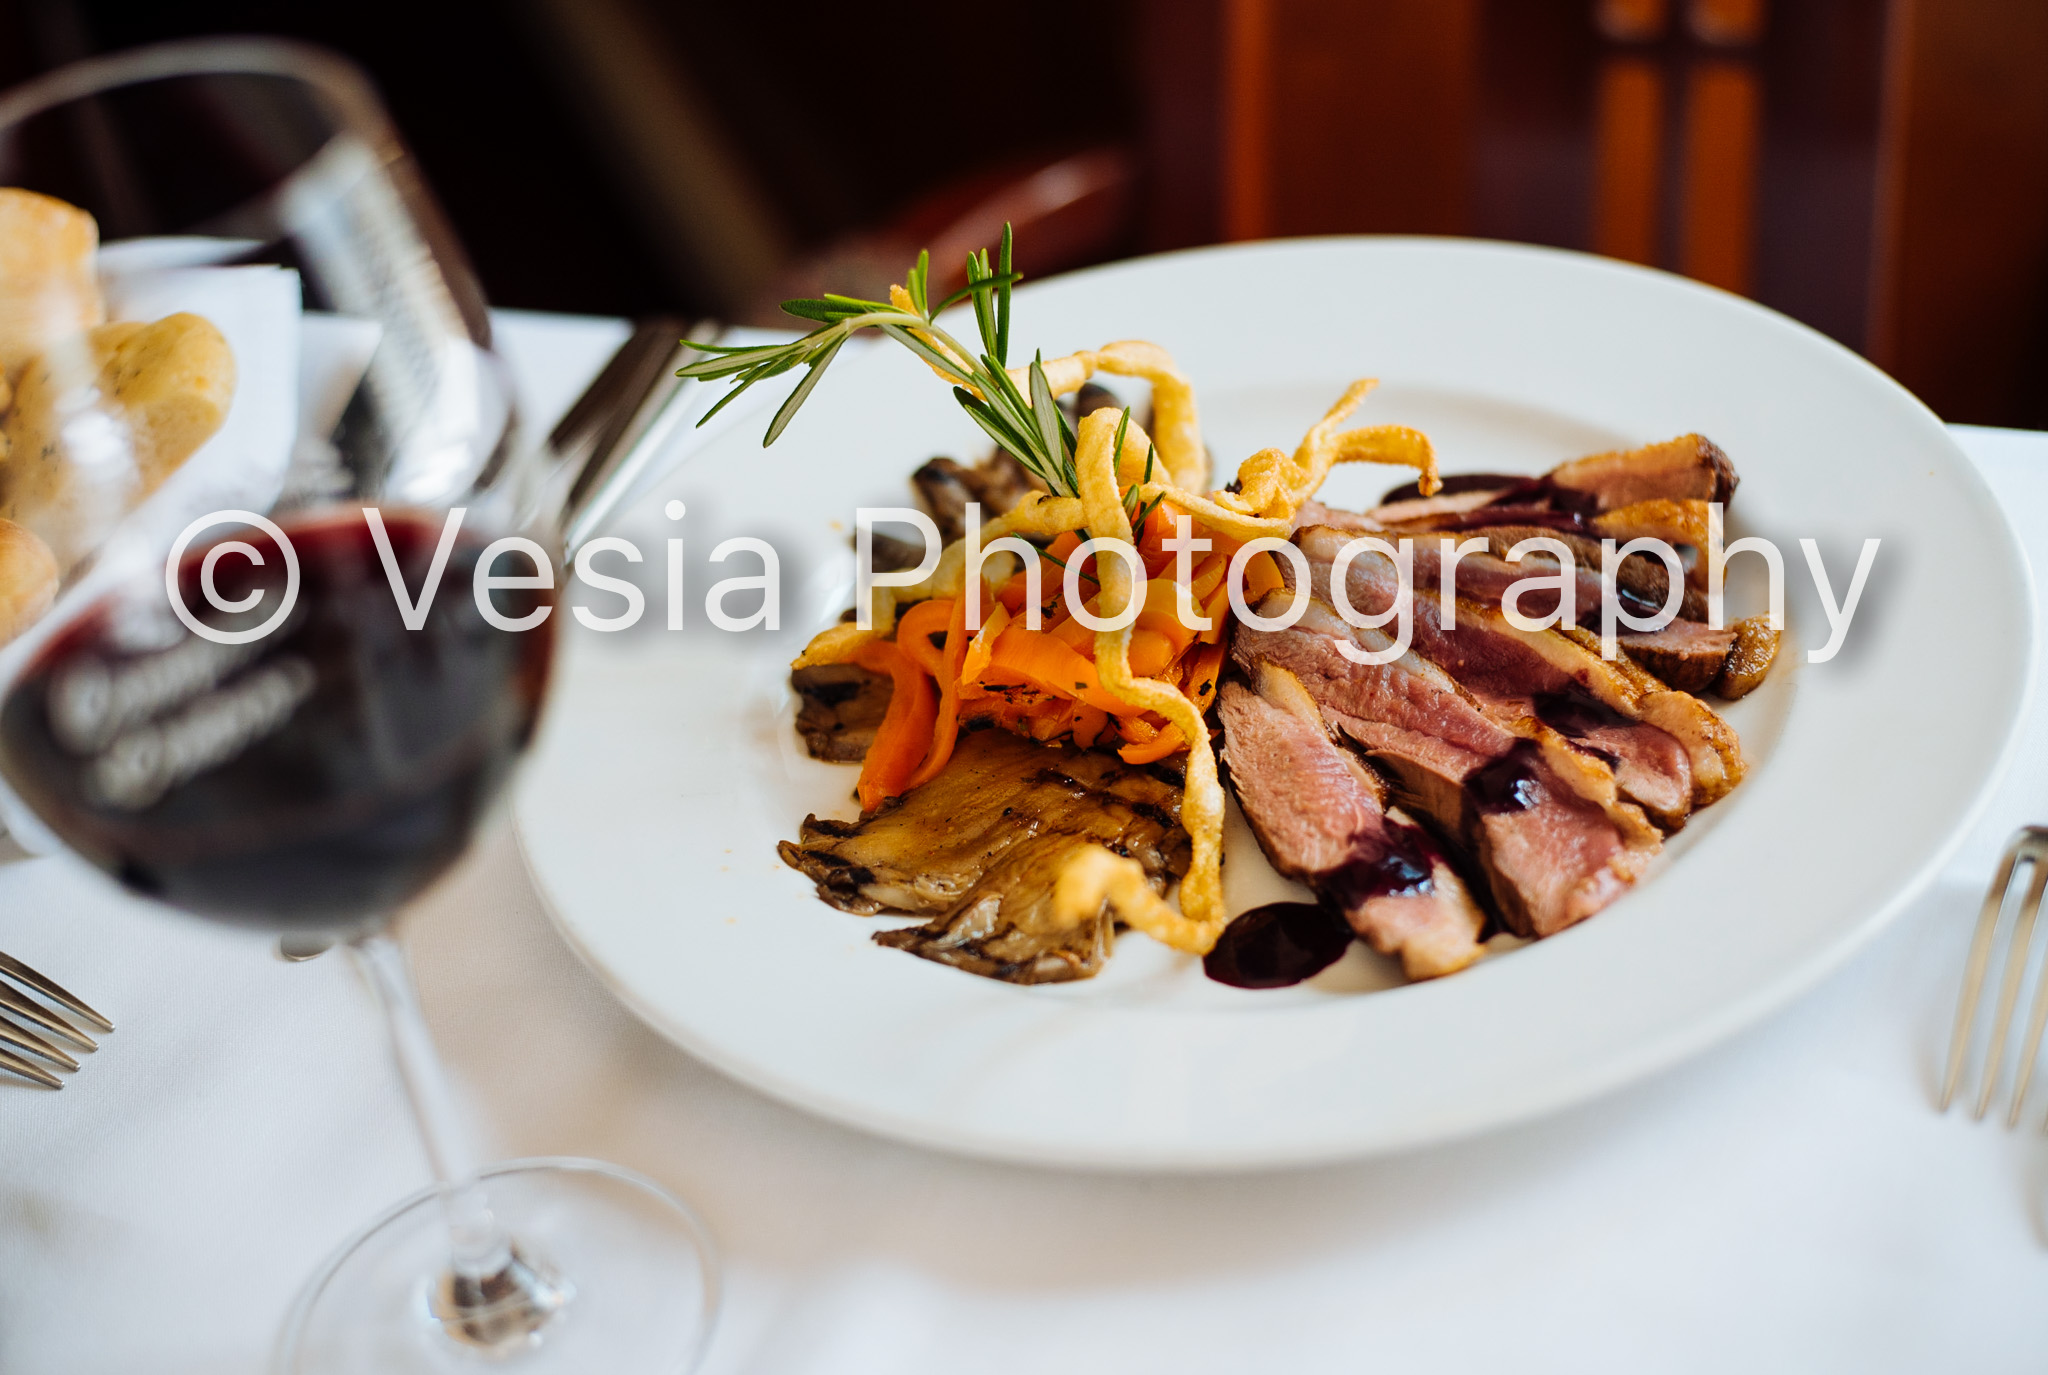 Campari_Centro_Food_Proofs-28.jpg